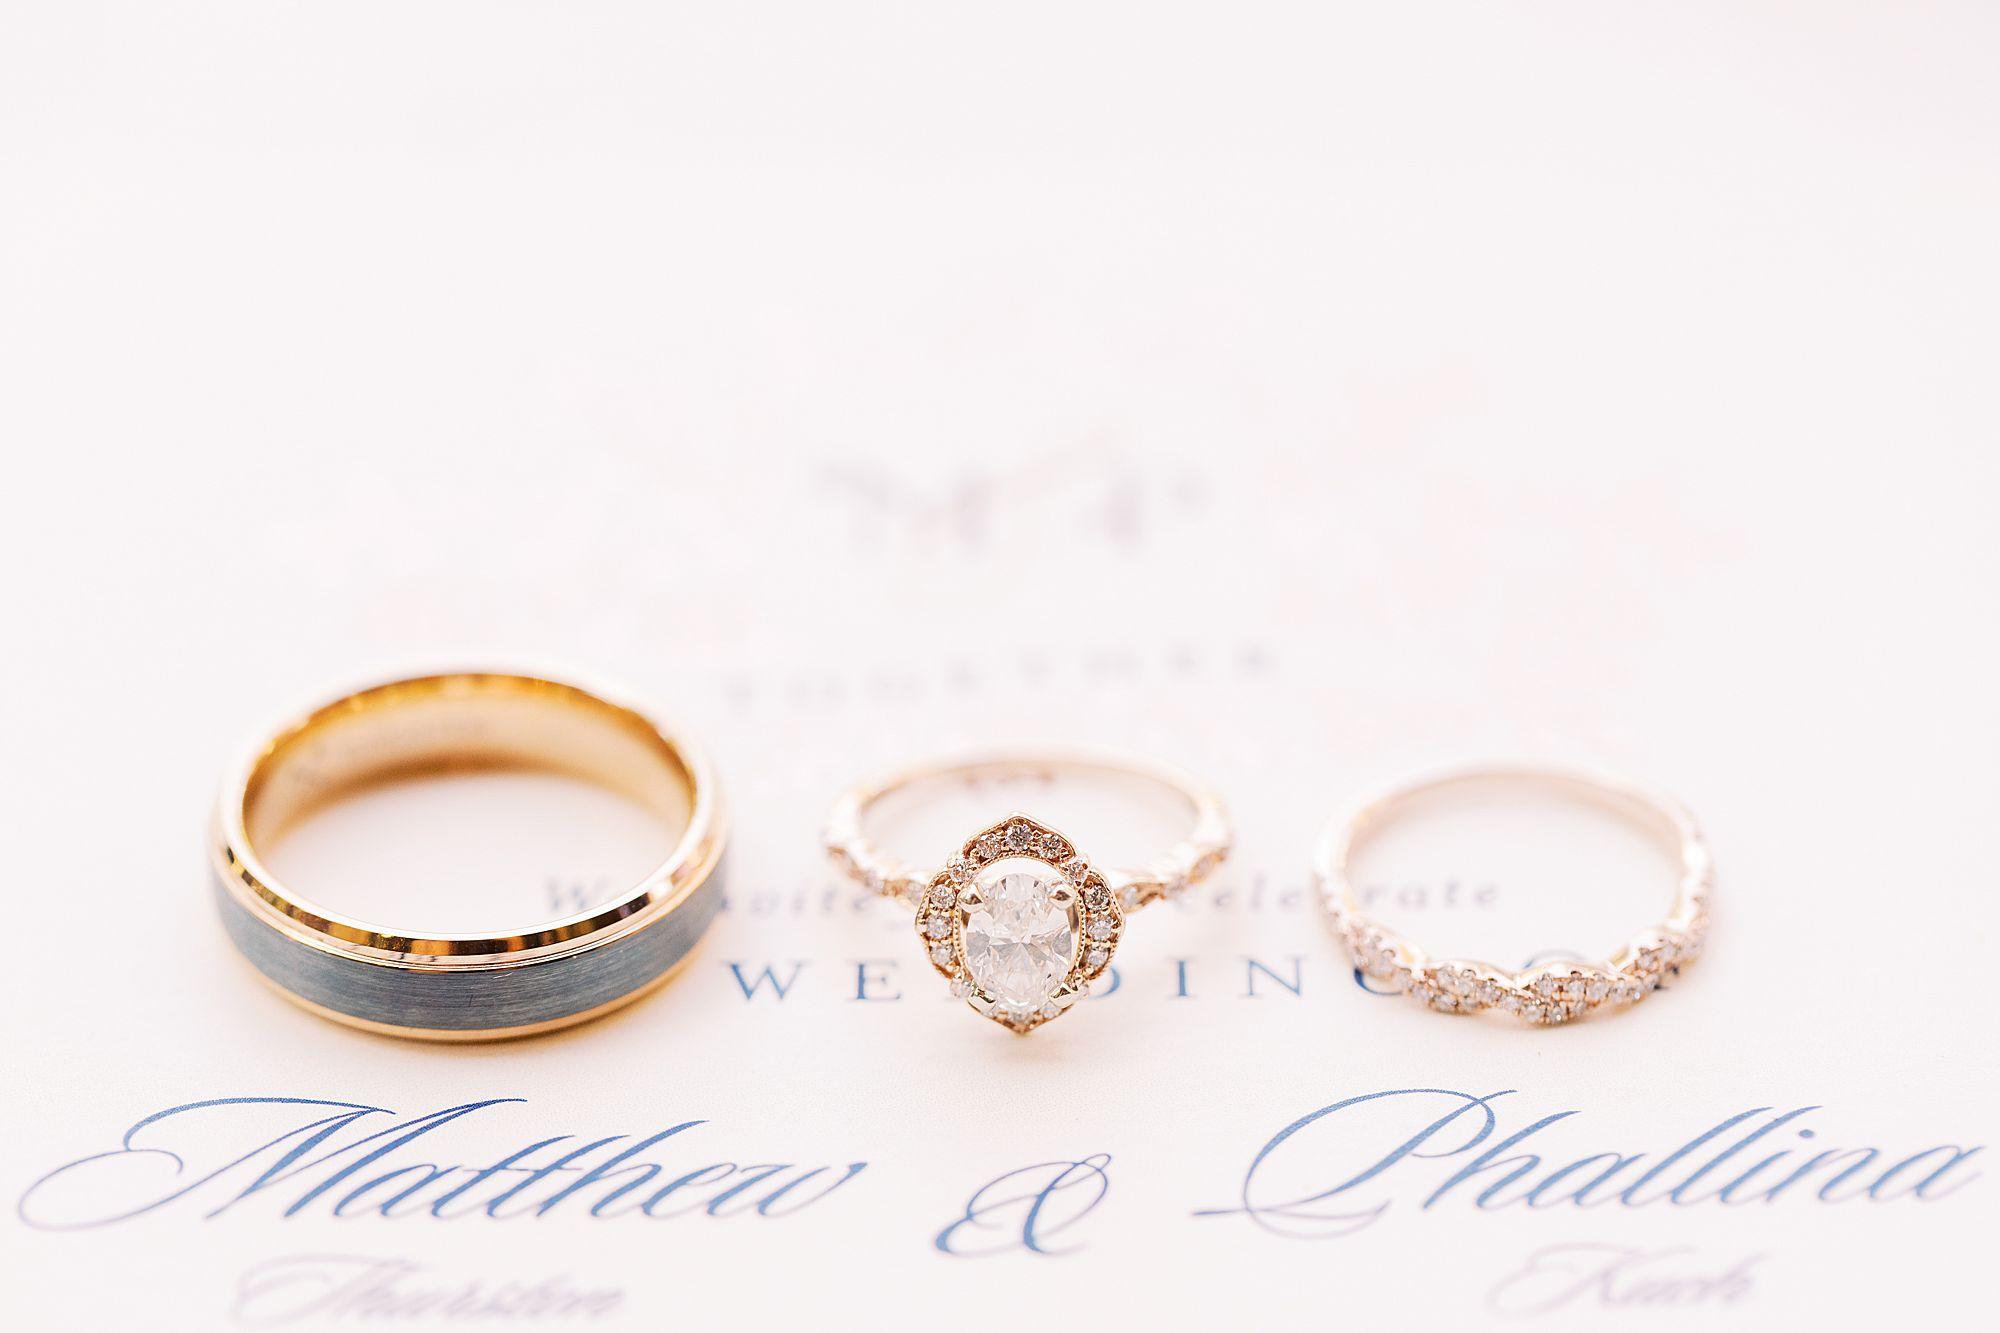 MITCHELLS MOUNTAIN MEADOWS Wedding - Ash Baumgartner - Phallina and Matt - Sierraville Wedding - Tahoe Wedding Photography_0001.jpg